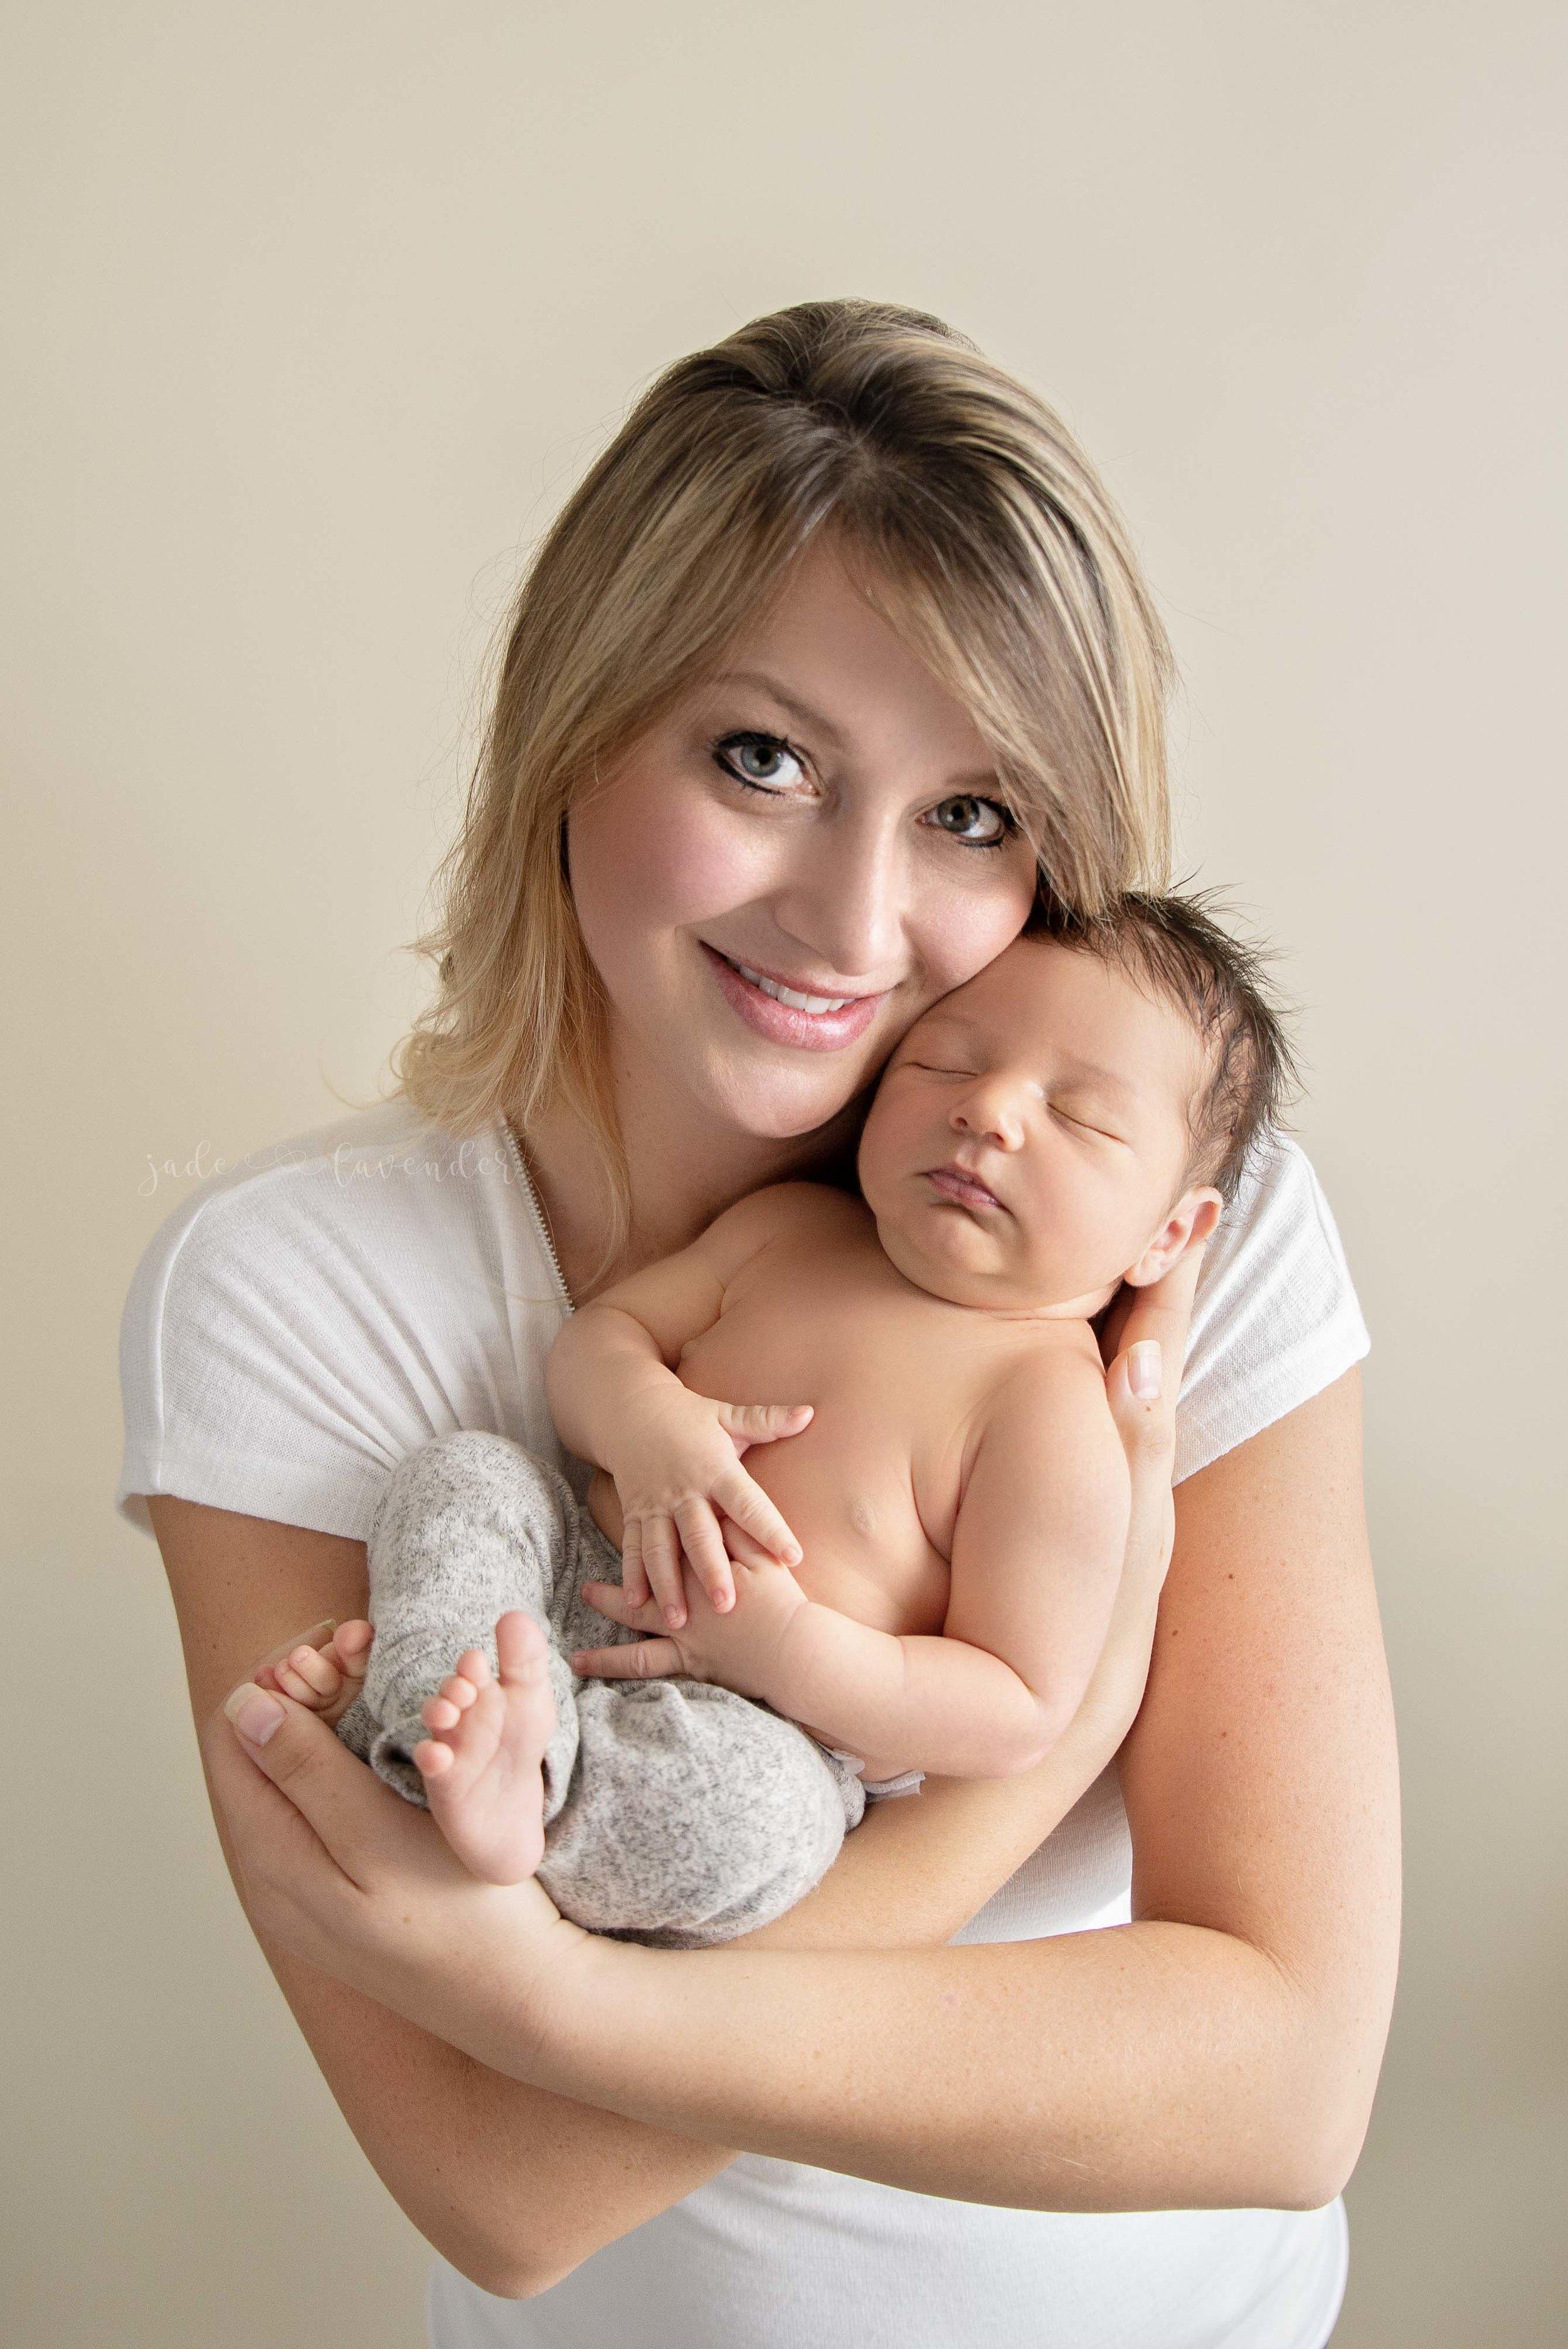 family-photos-newborn-photos-baby-images.jpg